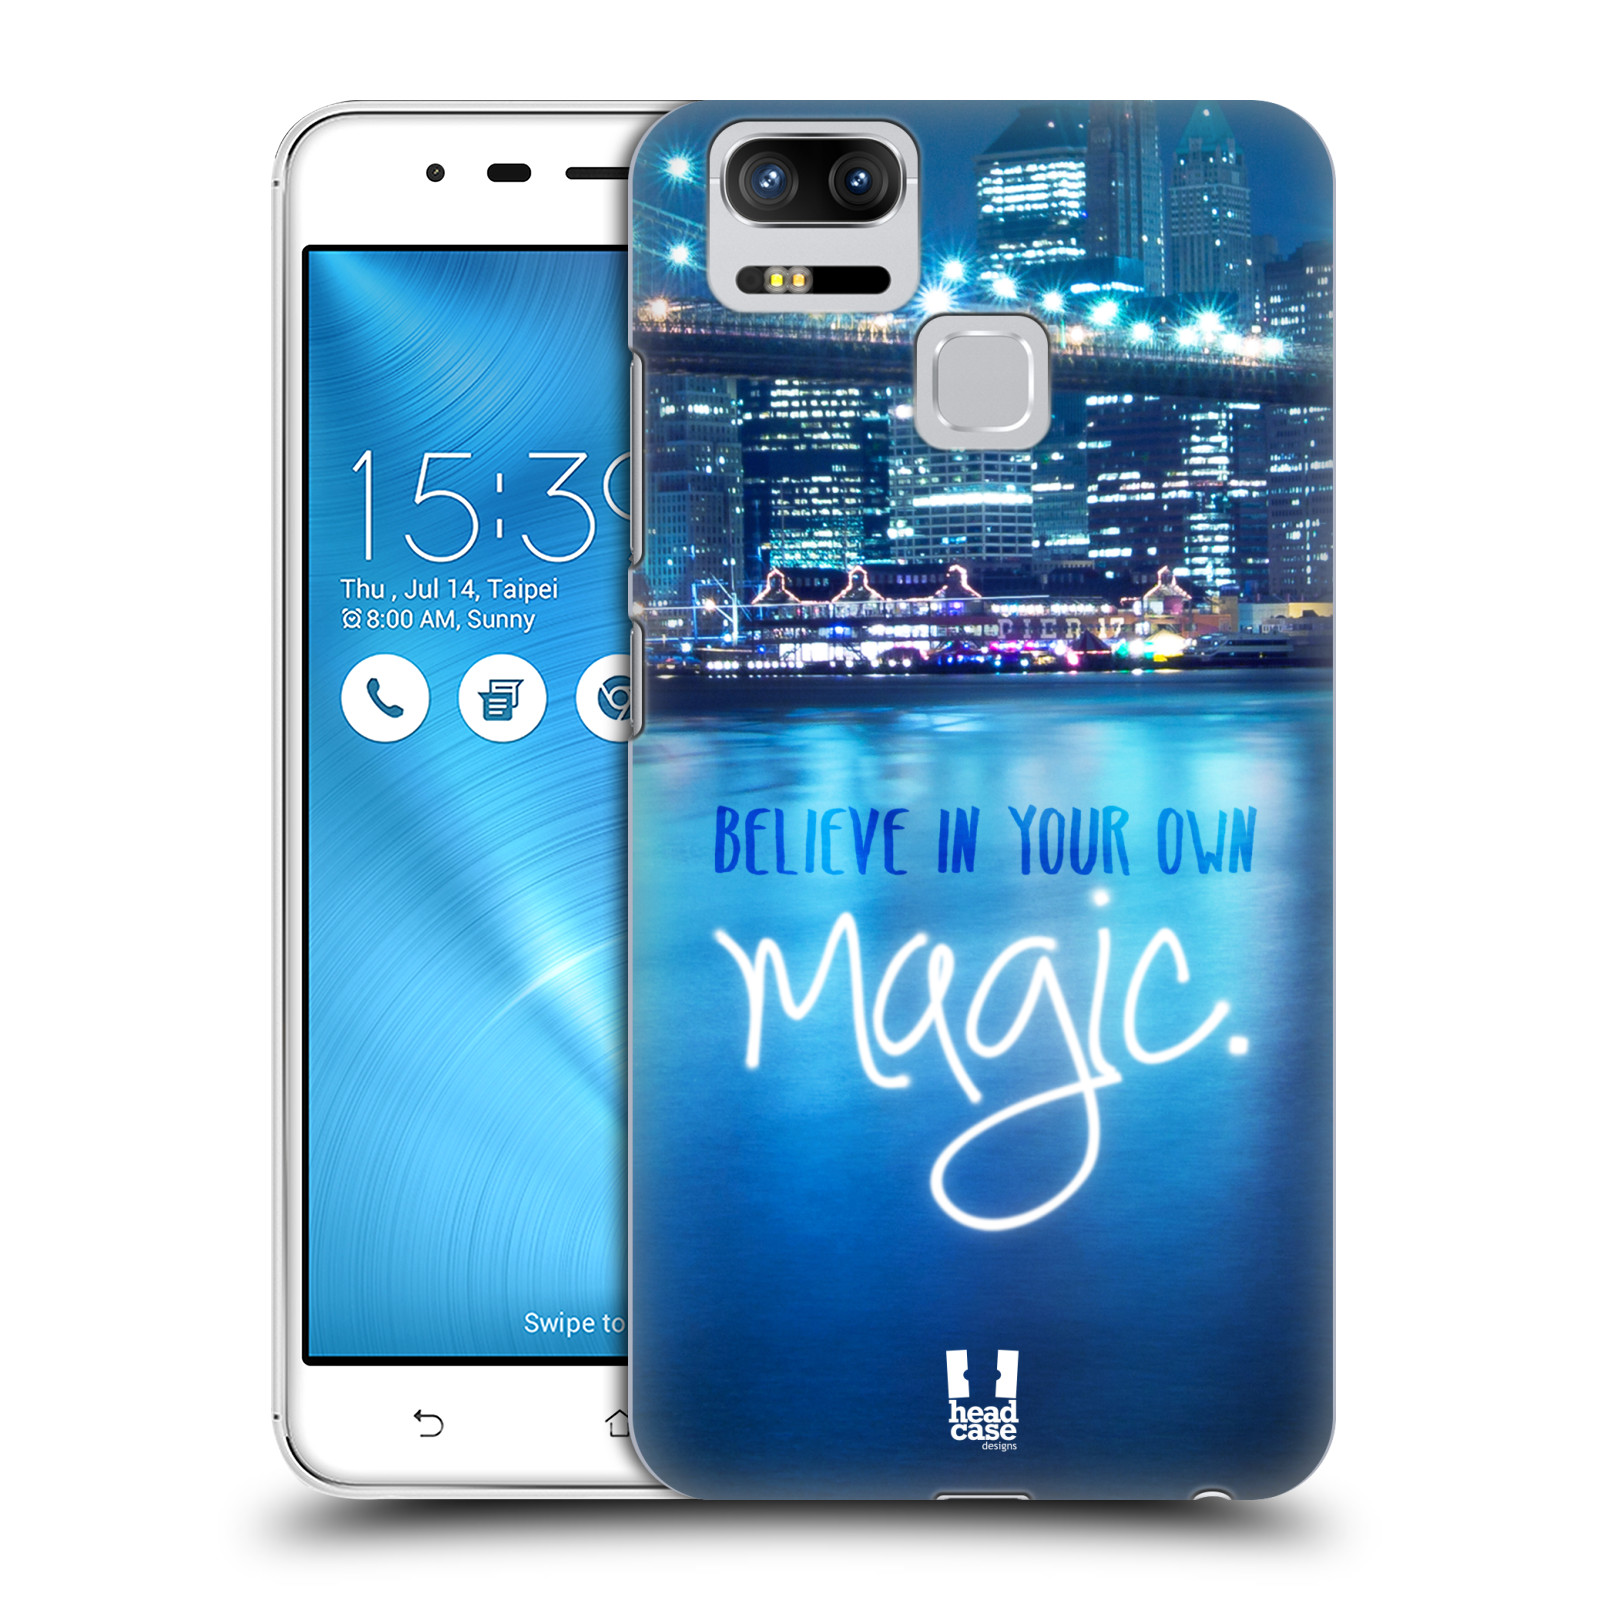 Plastové pouzdro na mobil Asus ZenFone 3 ZOOM ZE553KL - Head Case - MAGICAL (Plastový kryt či obal na mobilní telefon Asus ZenFone 3 ZOOM ZE553KL s motivem MAGICAL)